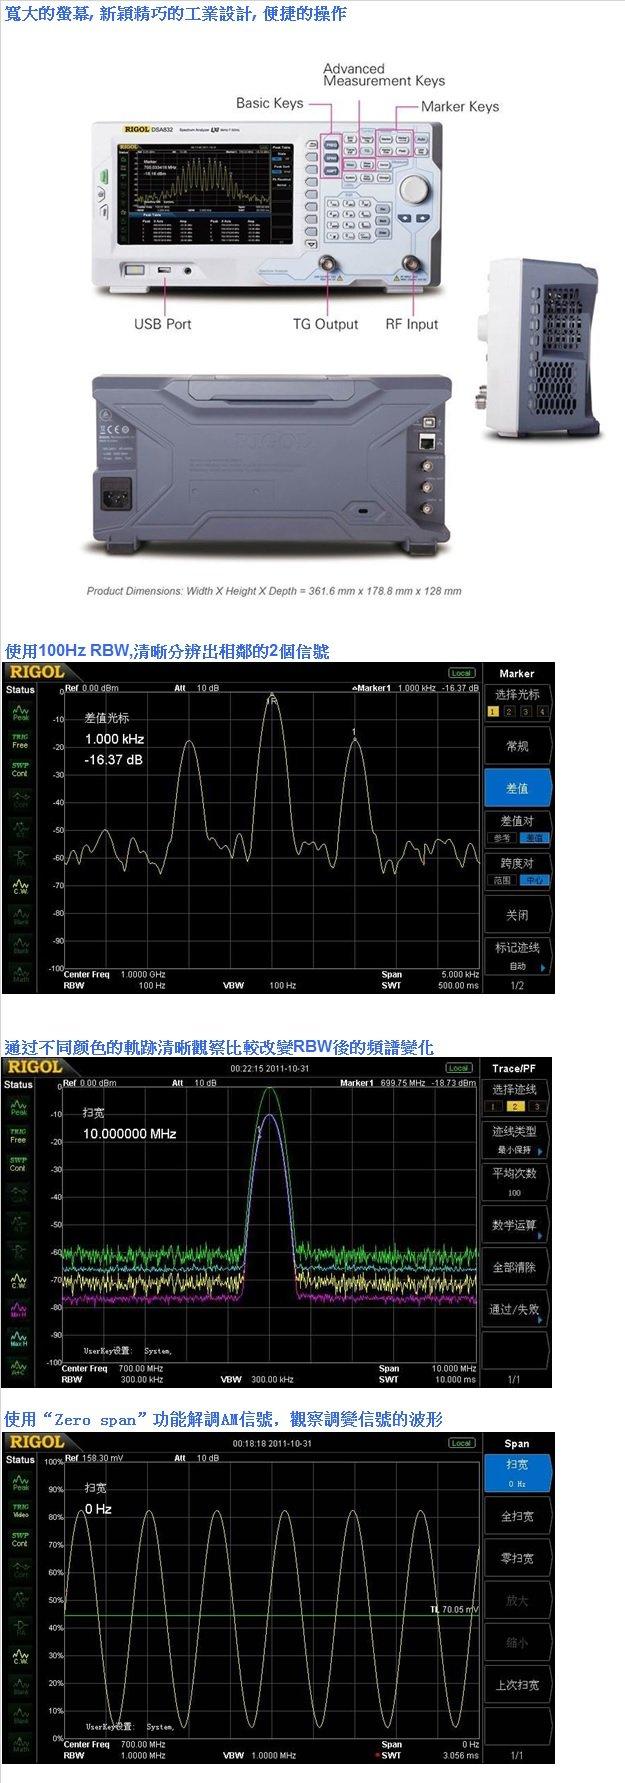 PChome Online 商店街- 銳誠科技- RIGOL DSA832 3 2GHz頻譜分析